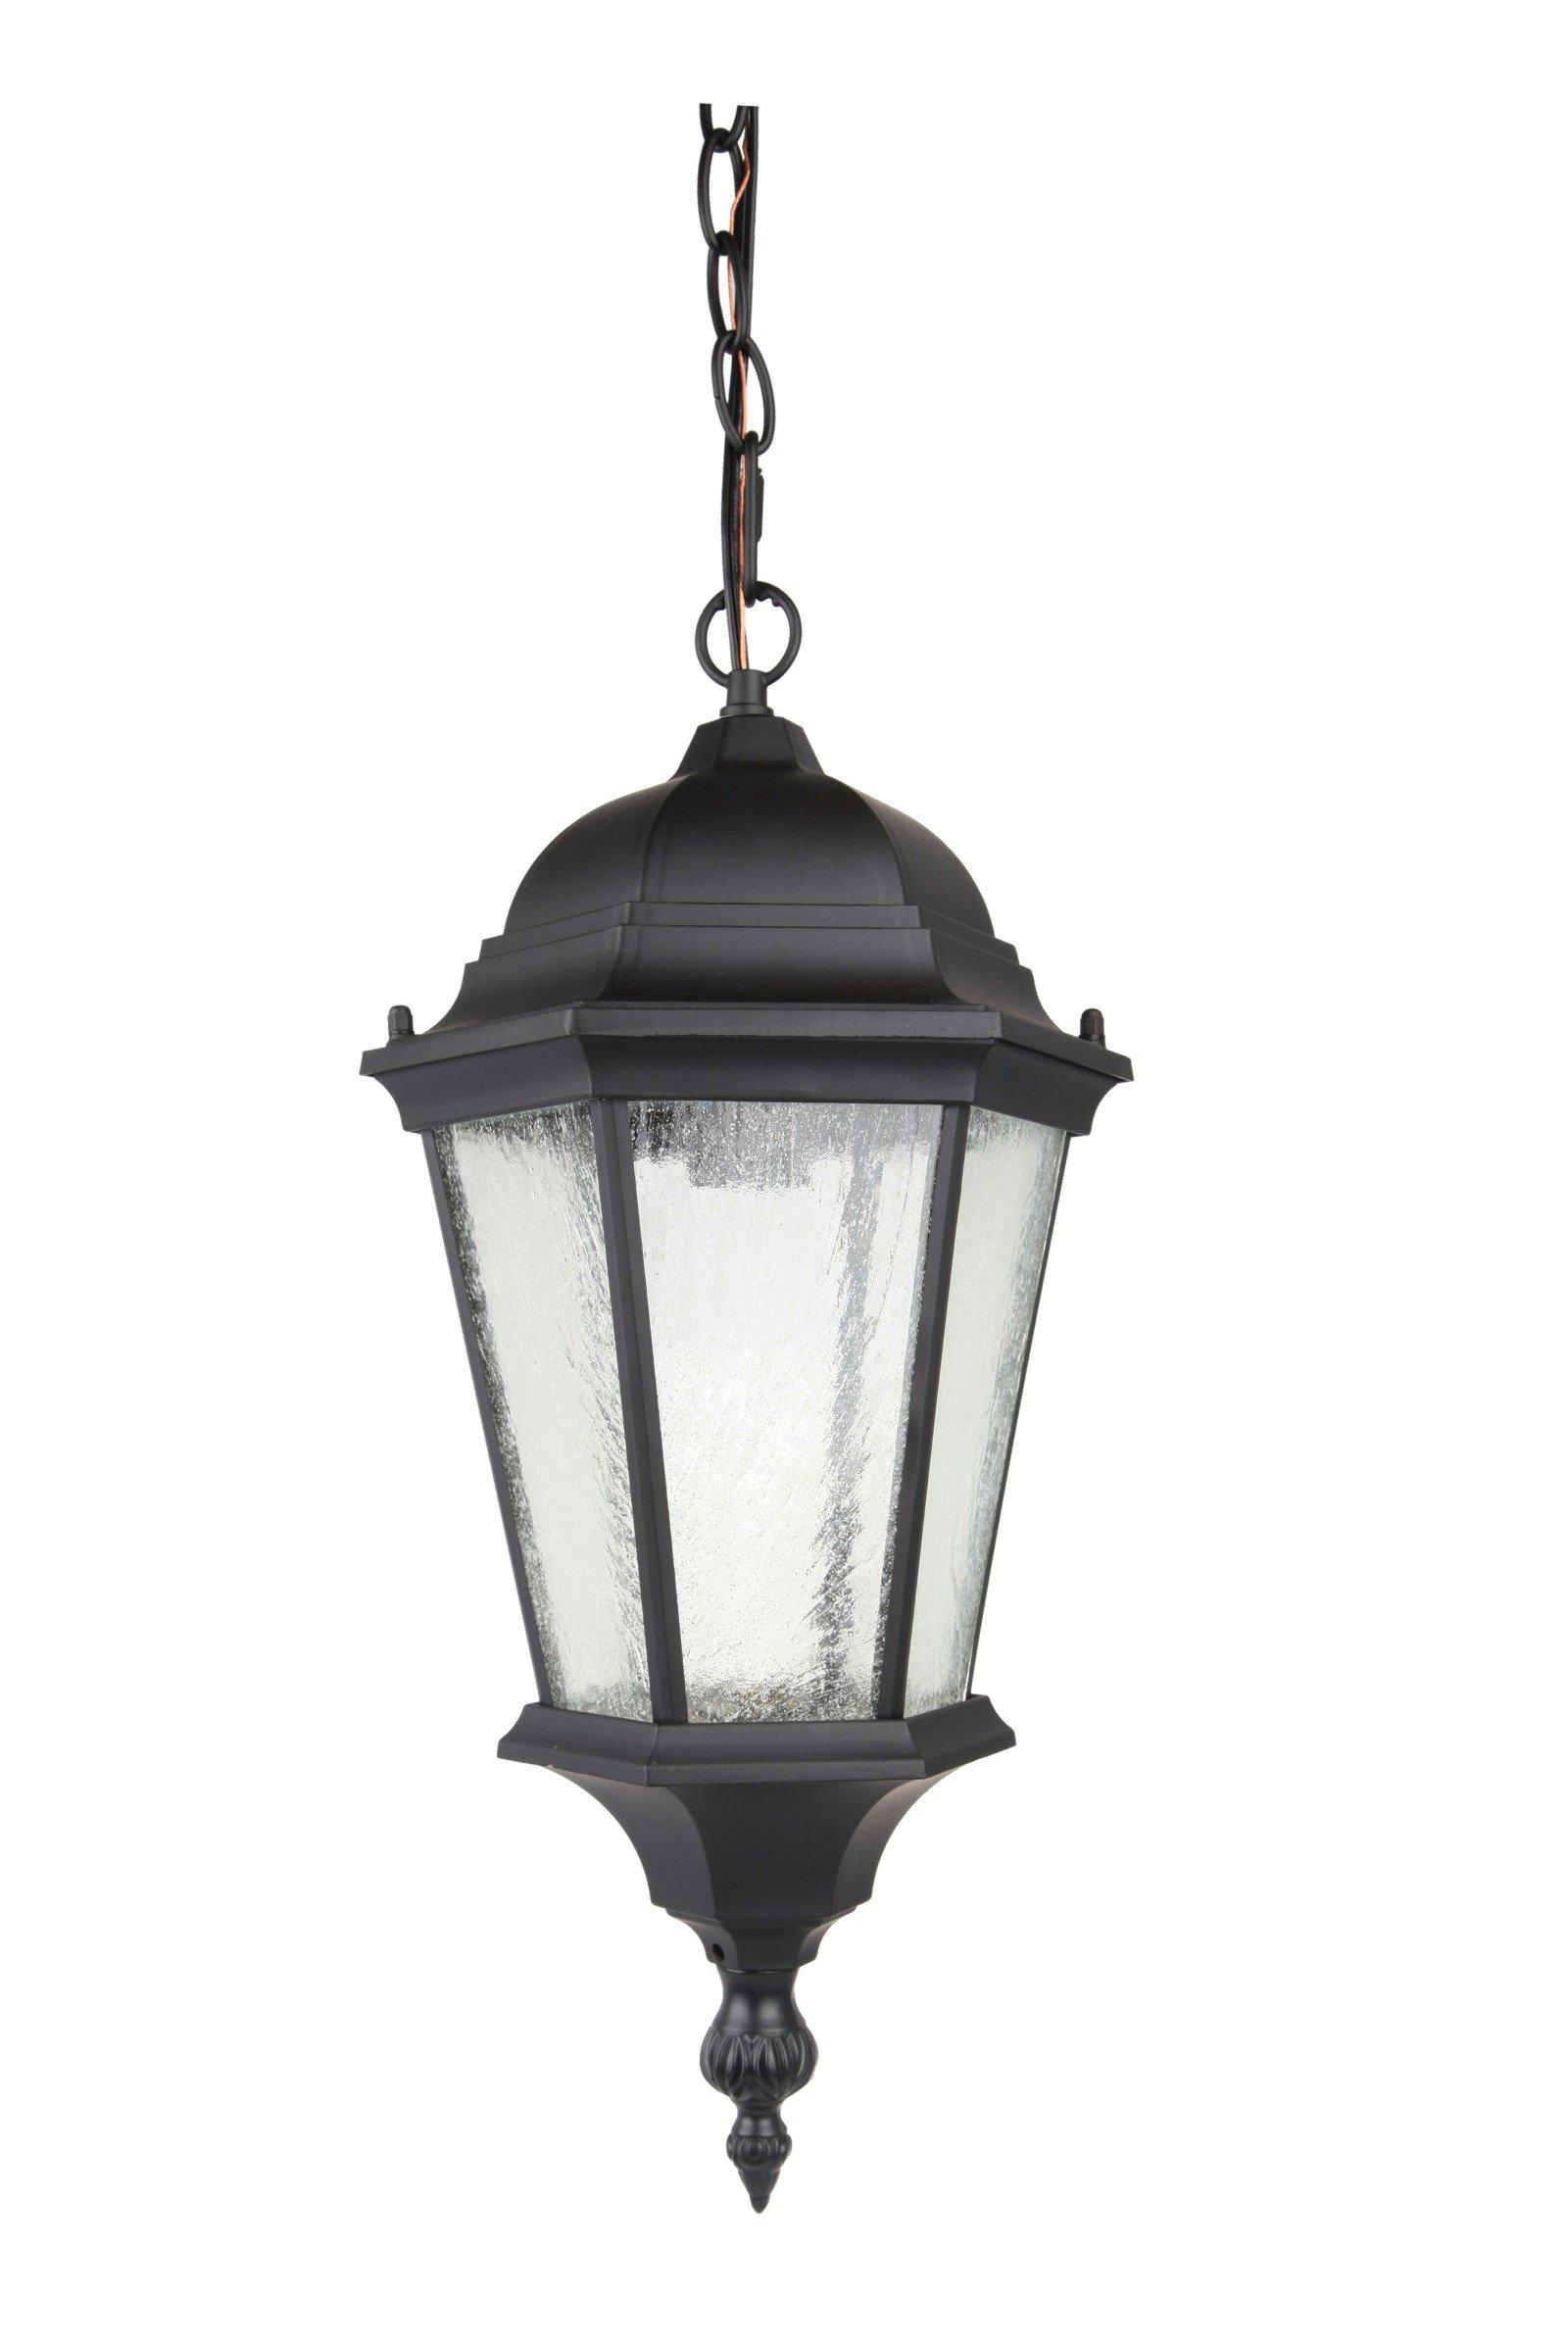 Elitco Lighting OD2602 Black-Light-Fixtures Outdoor Hang D8'' H20.25'' E26 100W